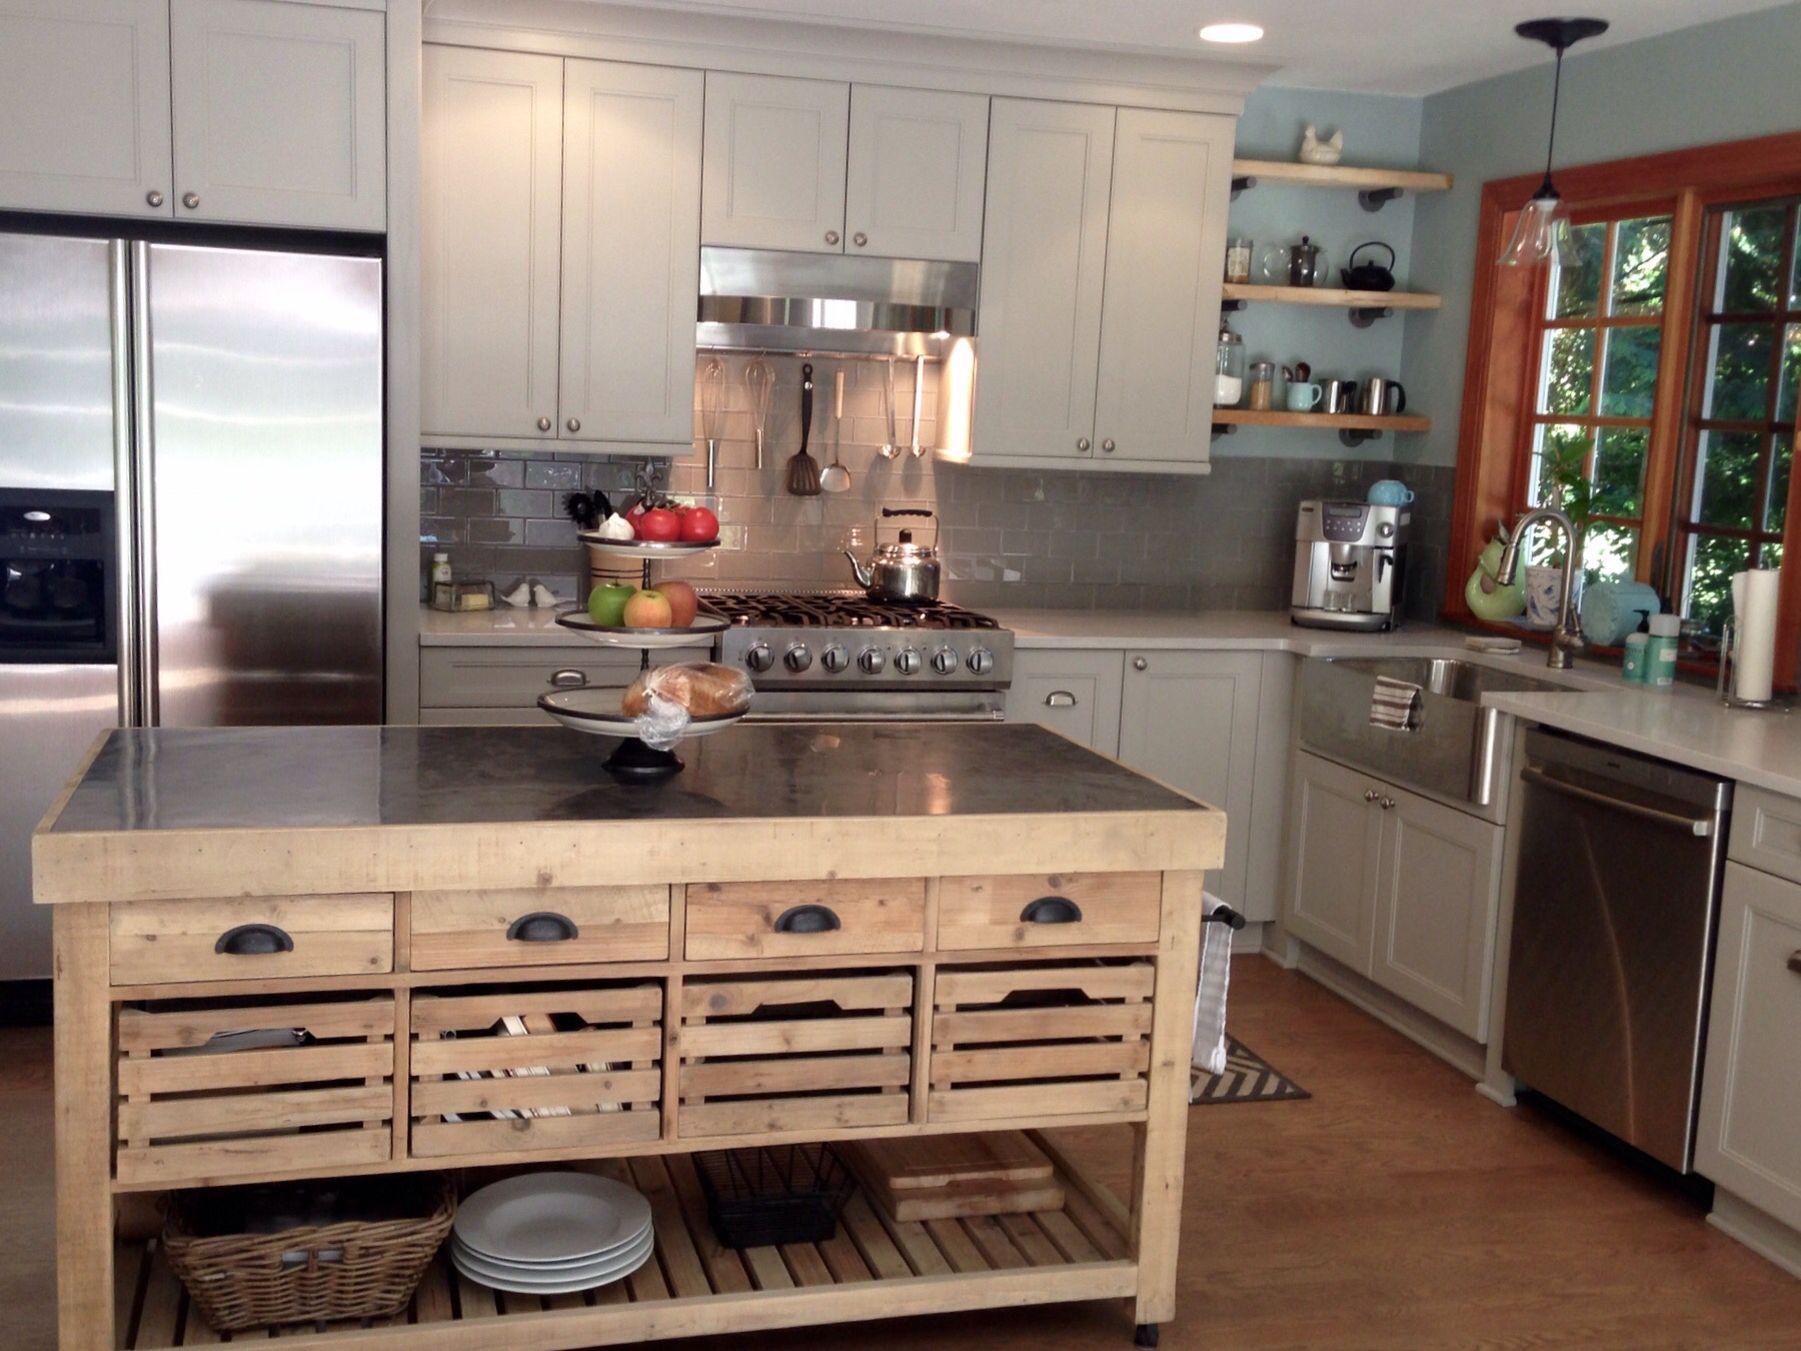 Williams Sonoma Kitchen Island Gray Cabinets Grey Griege Gl Subway Tile Stainless Farm Sink Open Shelving Restoration Hardware Quartz Countertops